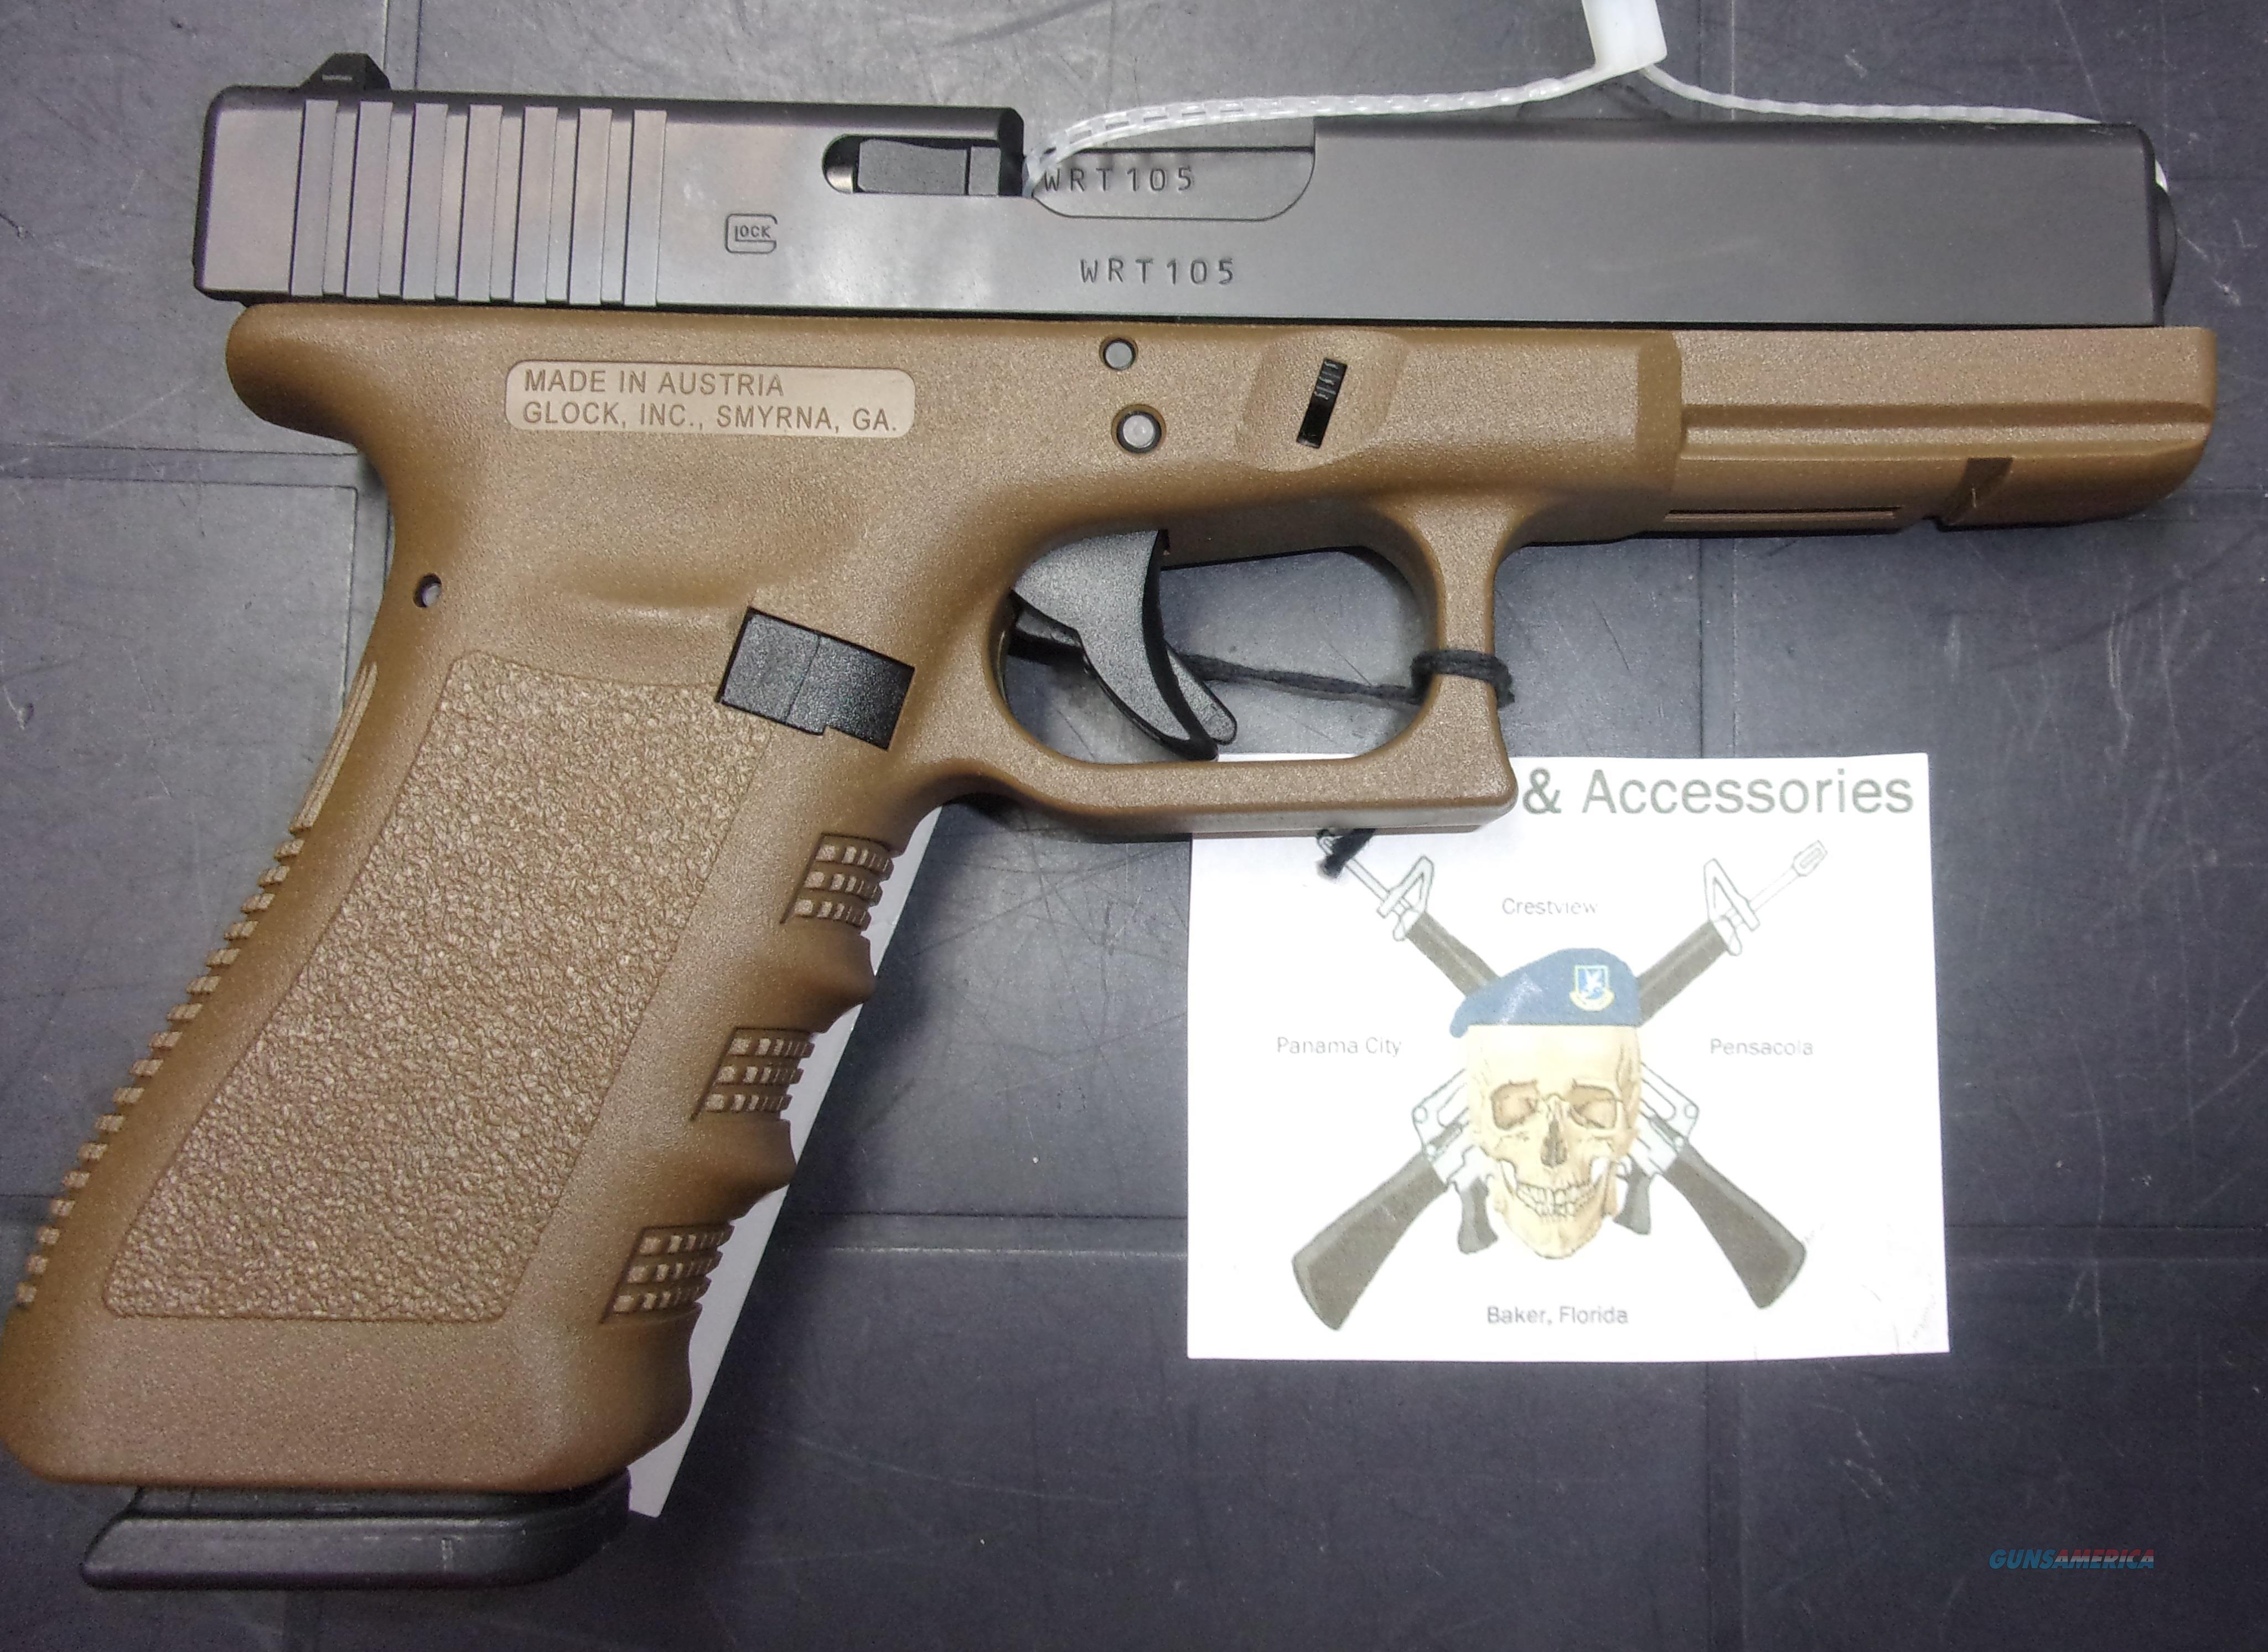 Glock 22 w/FDE Frame  Guns > Pistols > Glock Pistols > 22